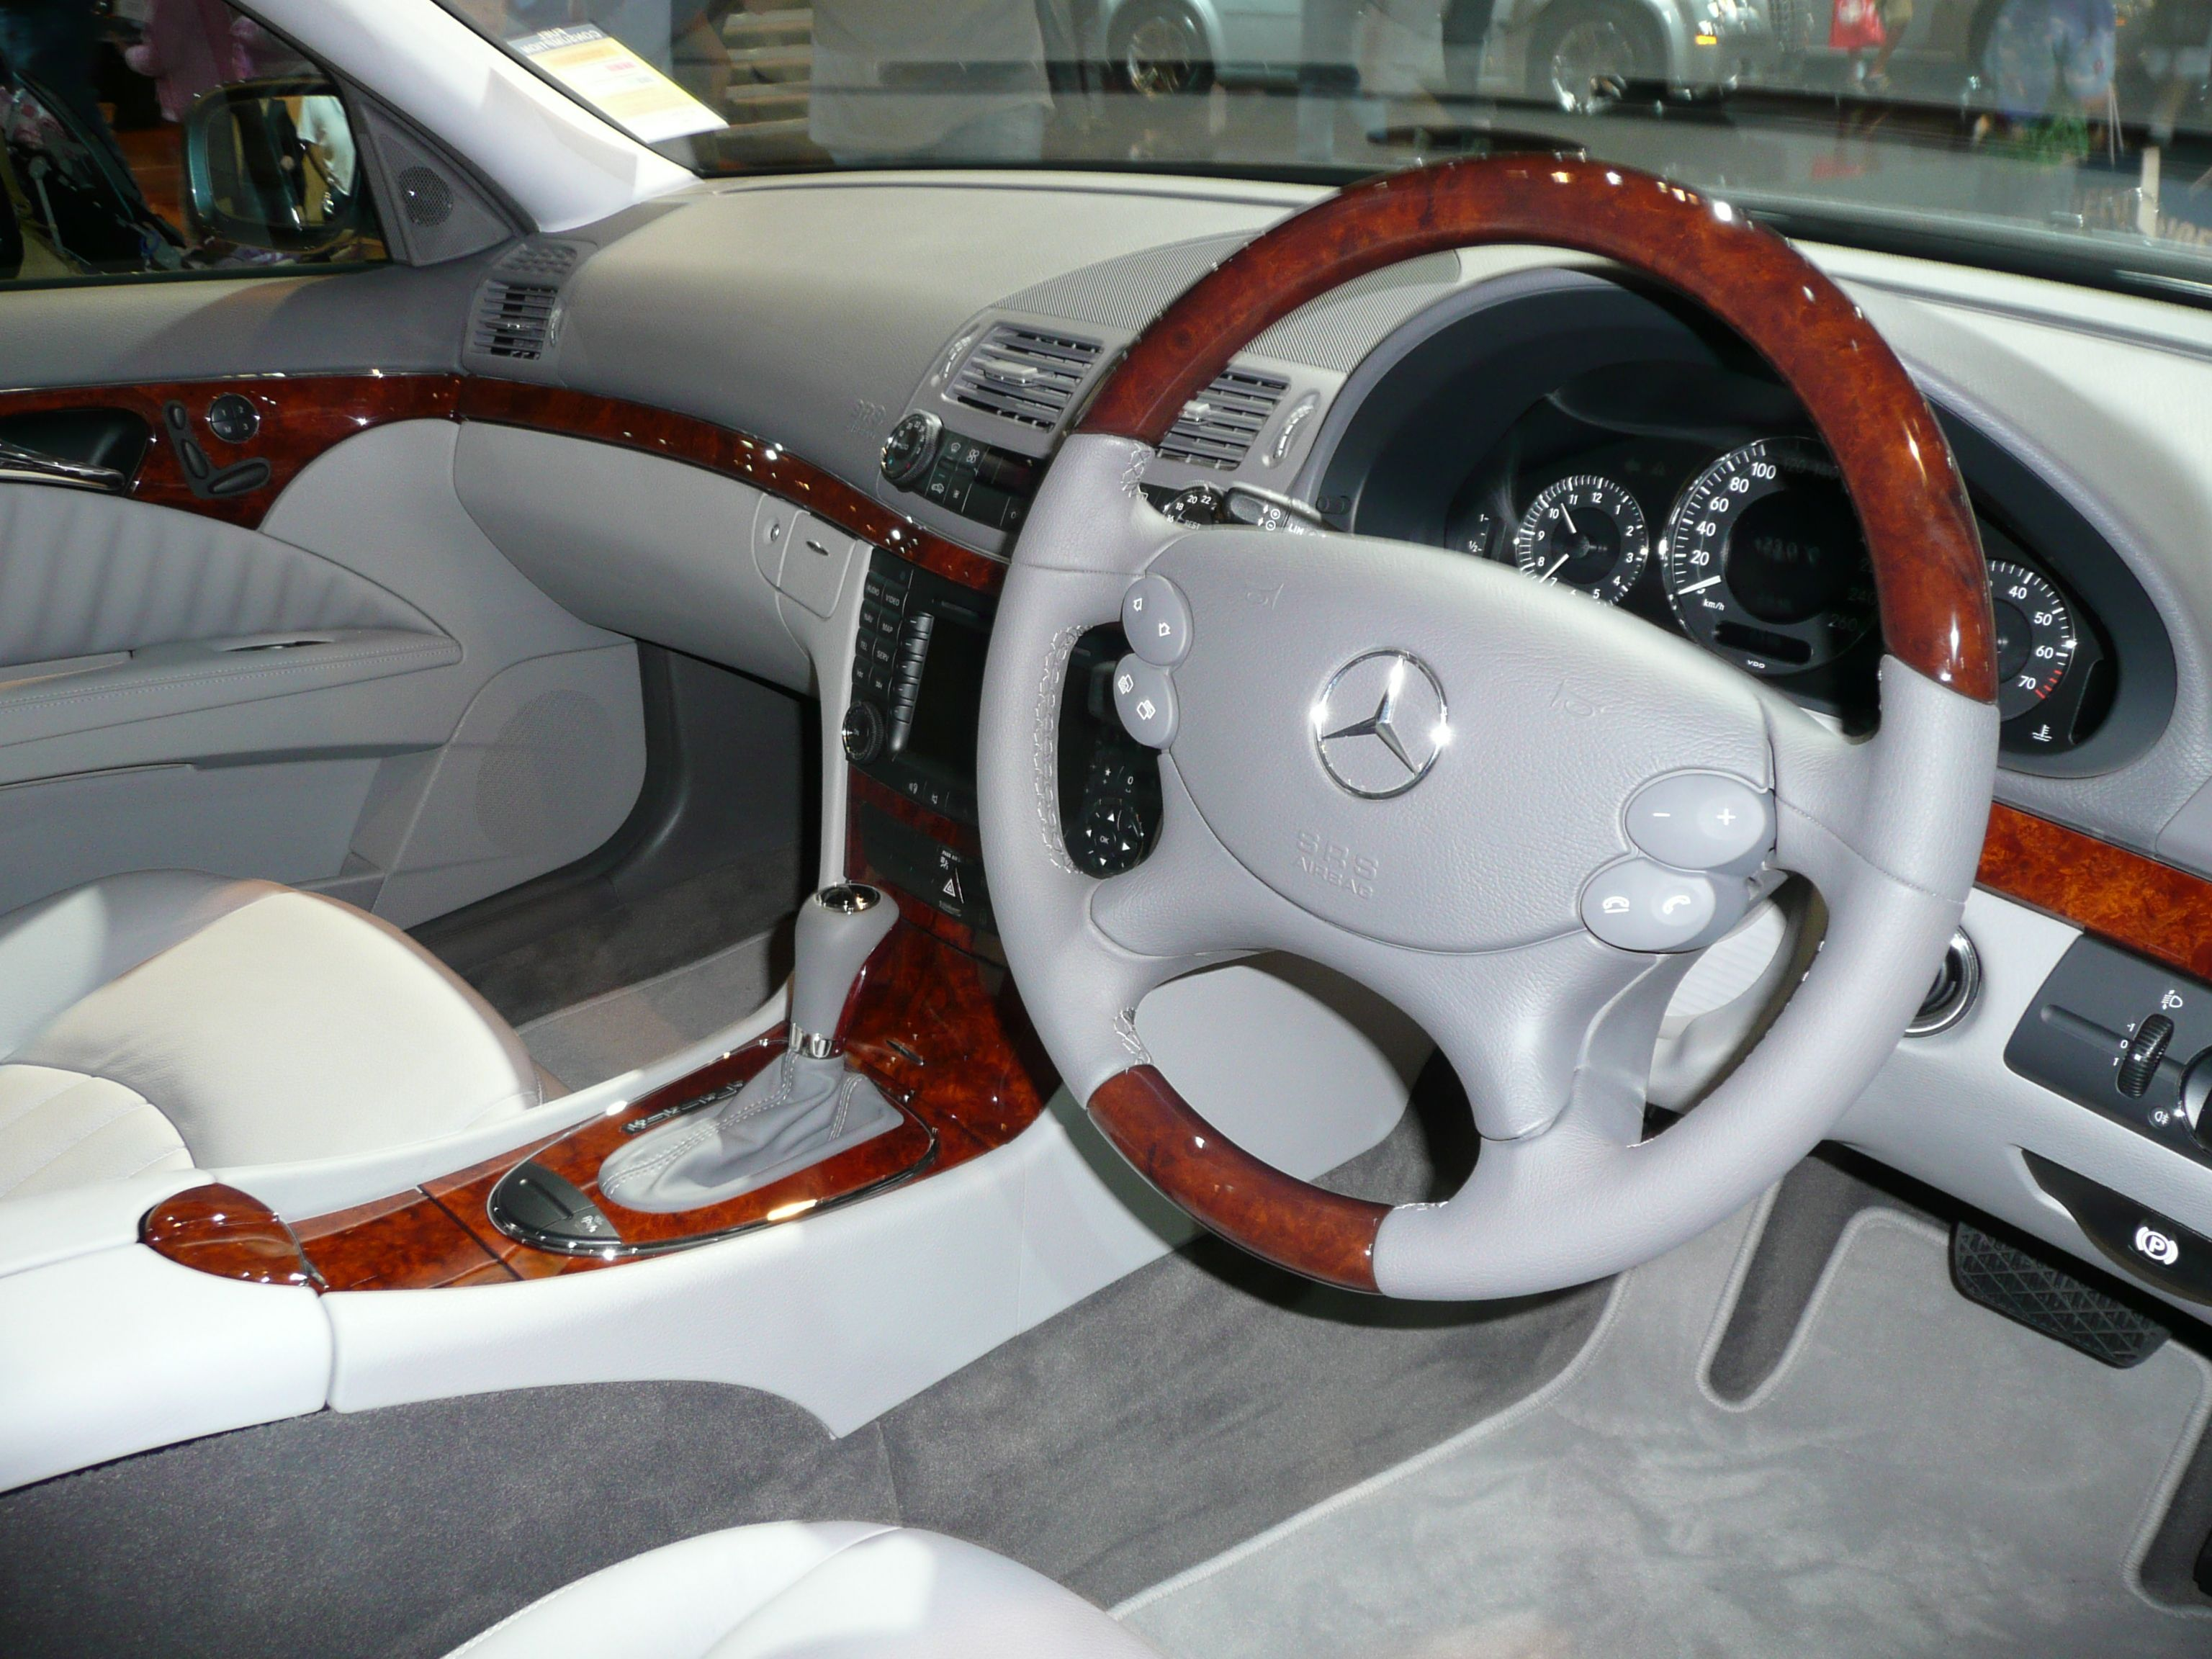 Mercedes benz e 63 amg s 4matic wagon fuel consumption combined 10 5 l 100km co2 emissions combined 246 g km mbcars e class pinterest photos